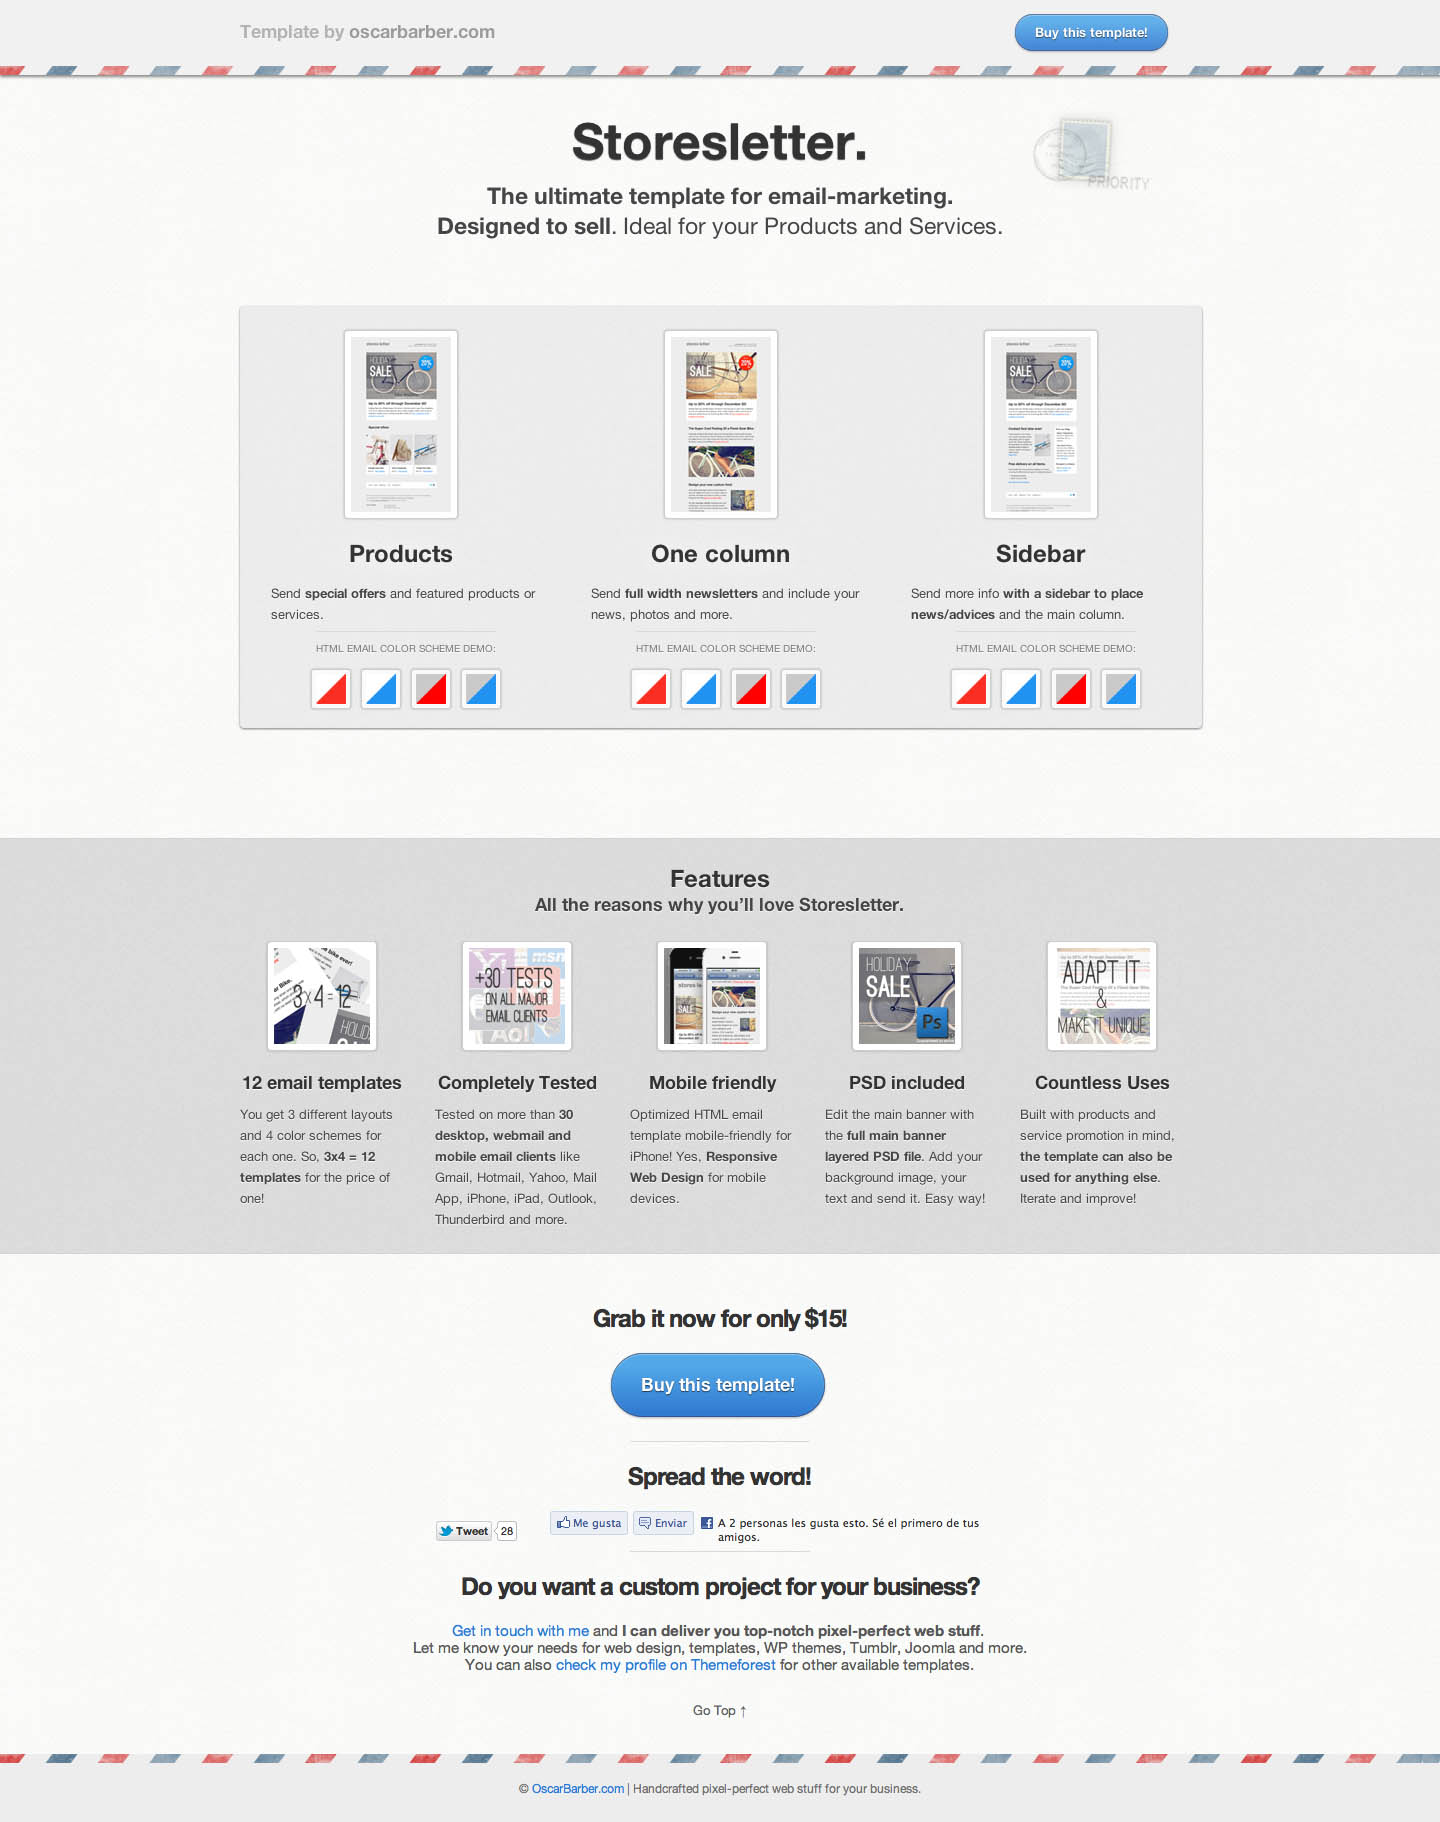 Storesletter Website Screenshot